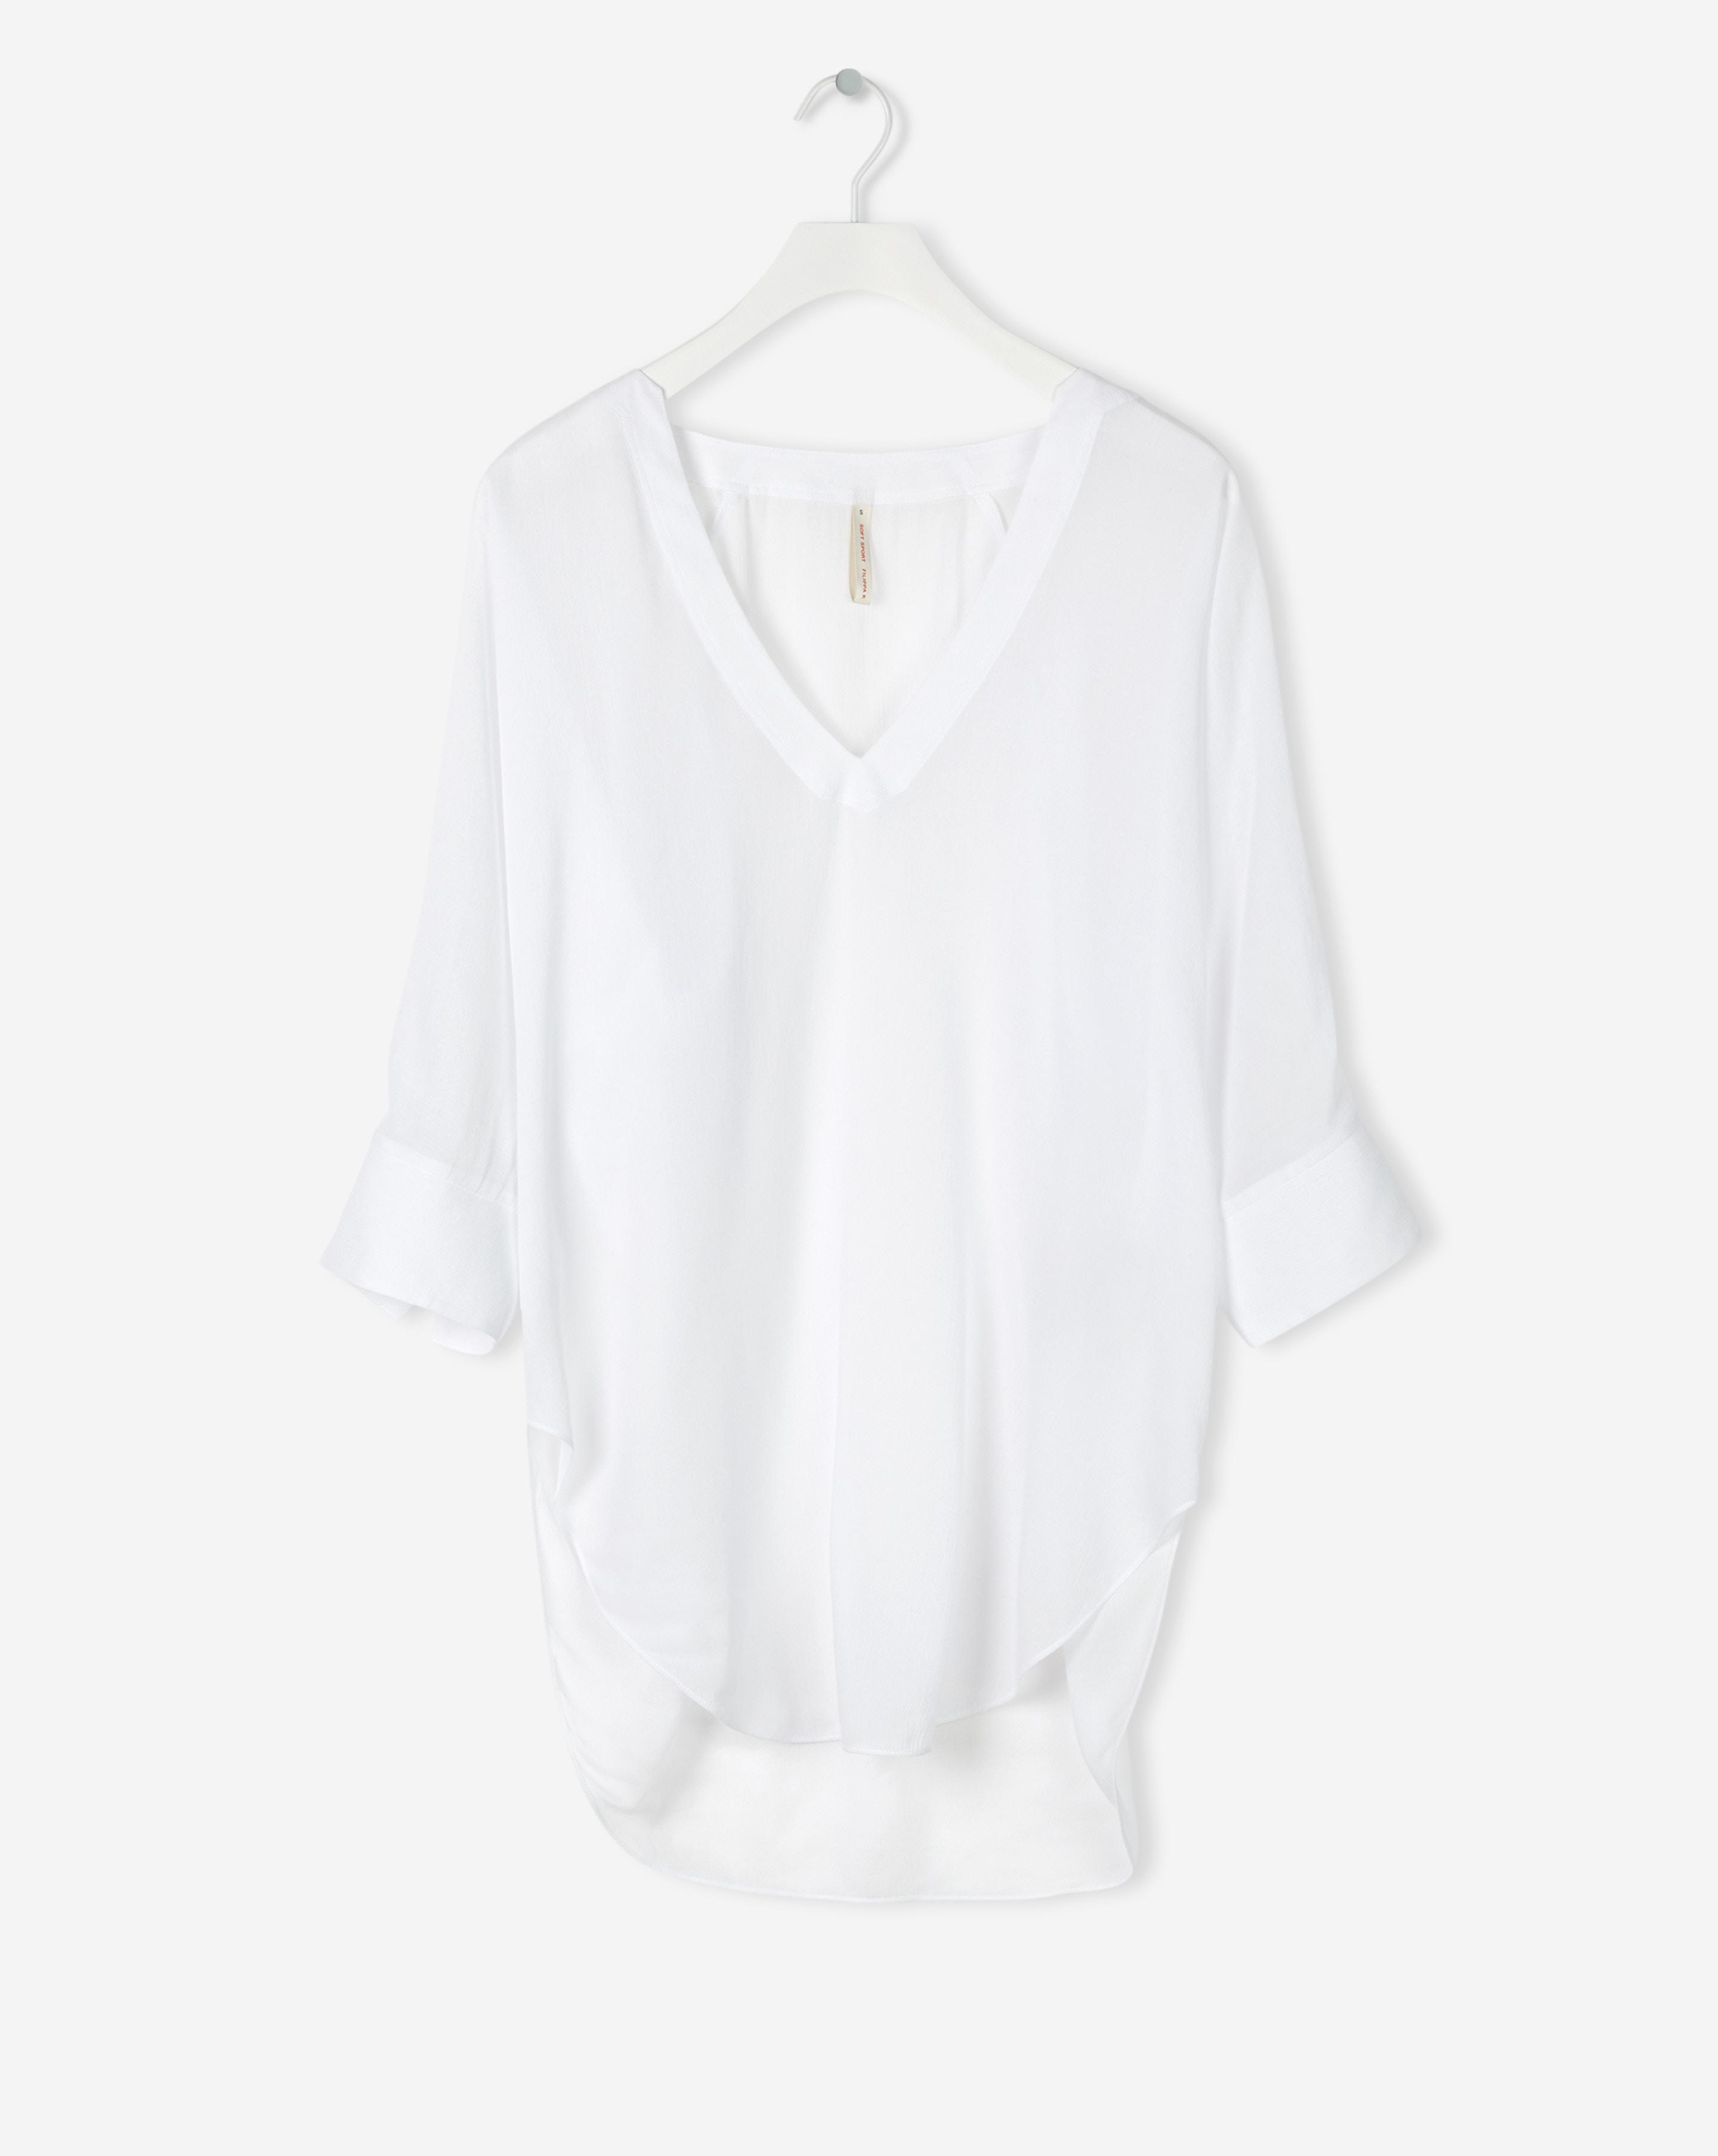 9a9cd7e3d4d Lyst - Filippa K Zoe Tunic Top White in White